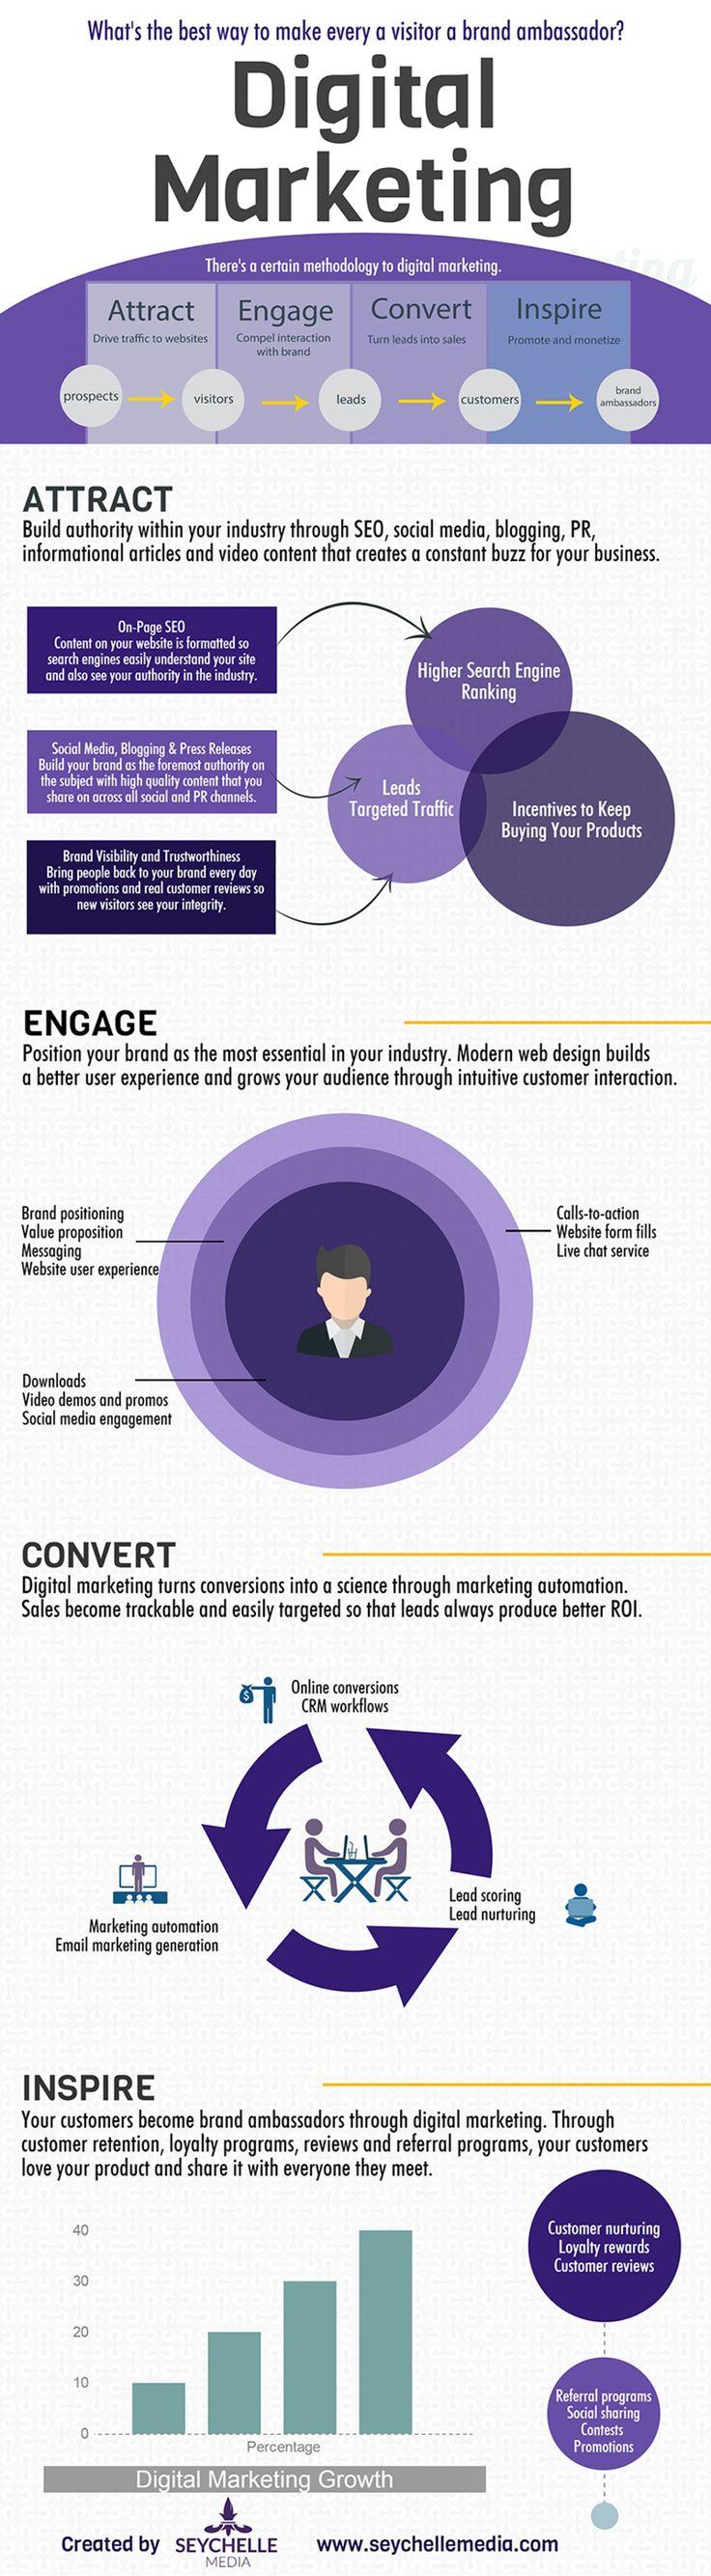 [#Infographic] How to Turn Visitors into #Brand Ambassadors: #DigitalMarketing